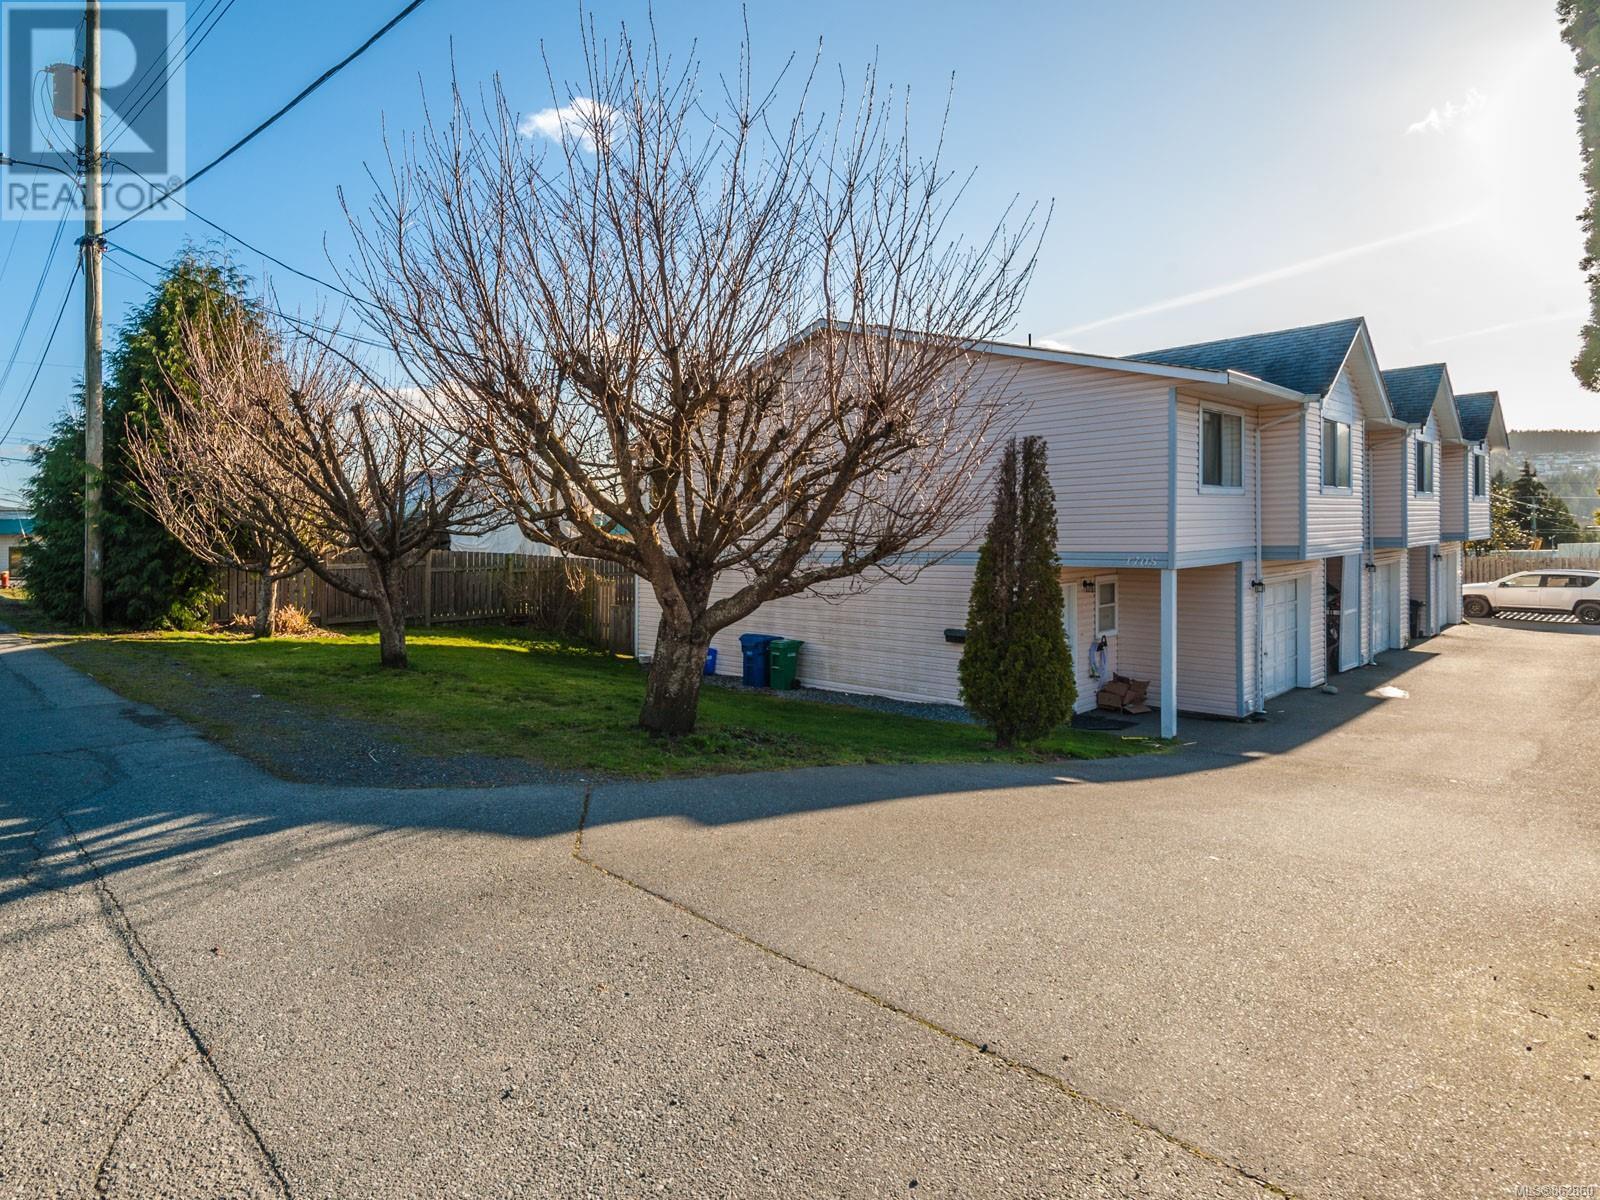 2 1705 Kerrisdale Rd, Nanaimo, British Columbia  V9S 1N4 - Photo 3 - 862860